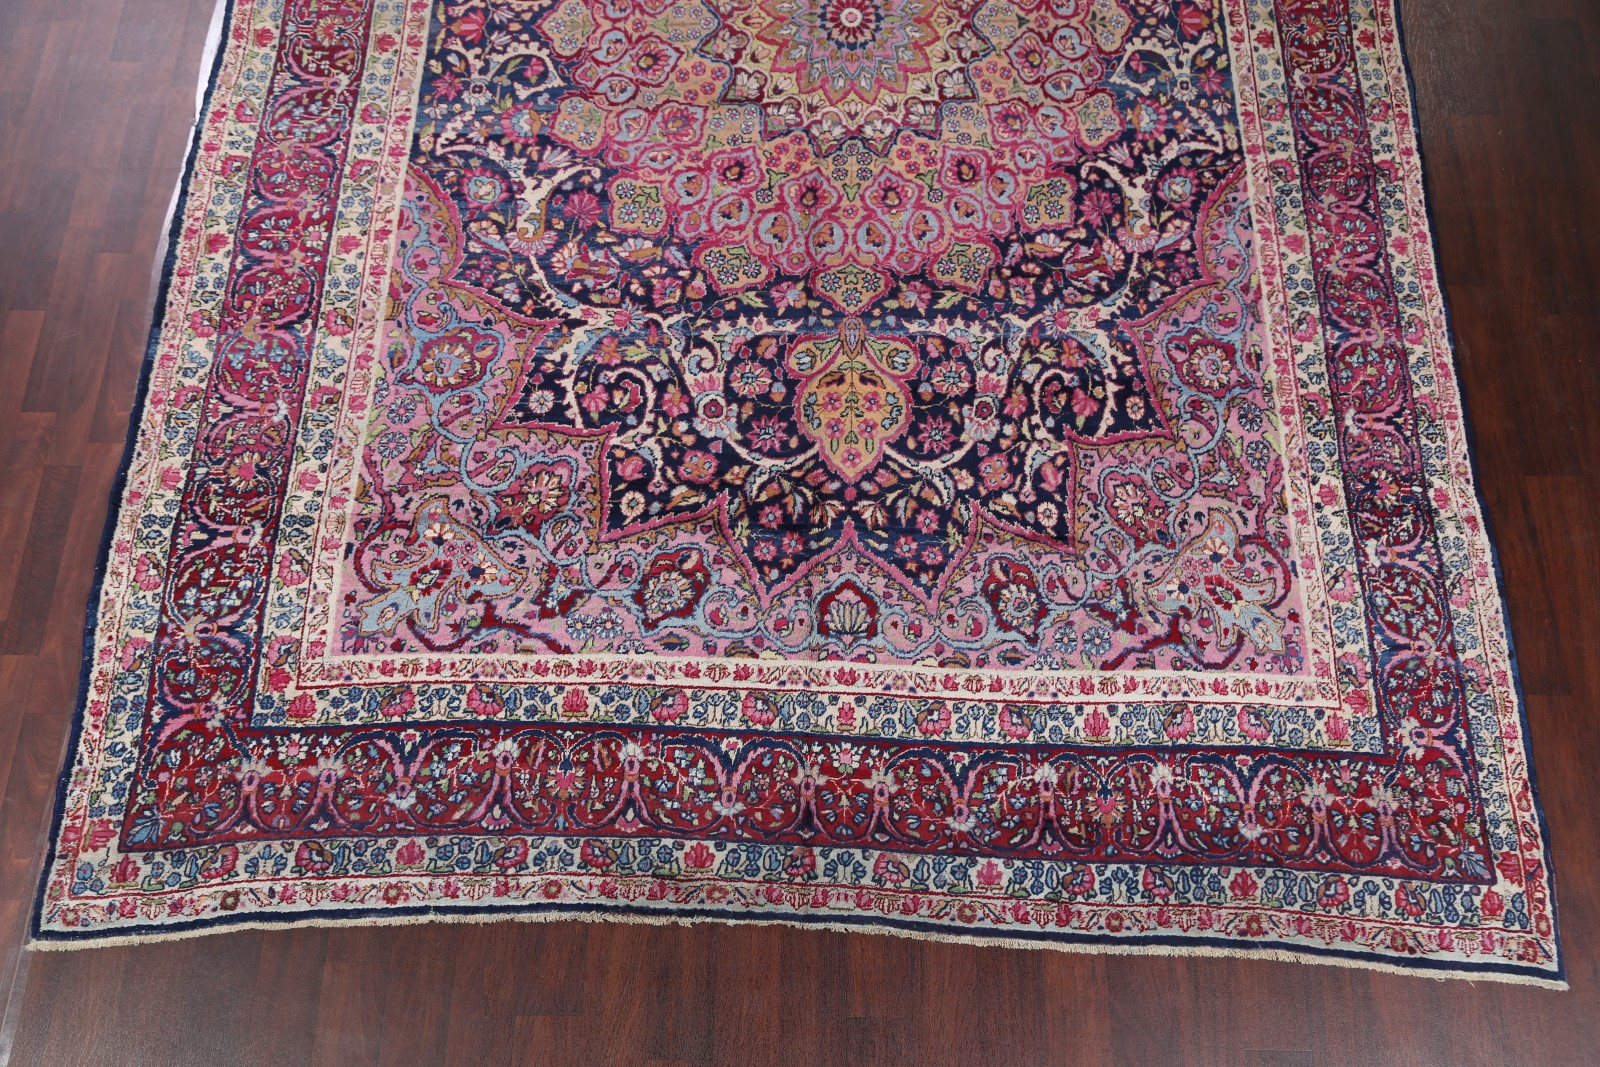 palace size antique geometric 10x15 kerman lavar ravar persian oriental area rug ebay. Black Bedroom Furniture Sets. Home Design Ideas